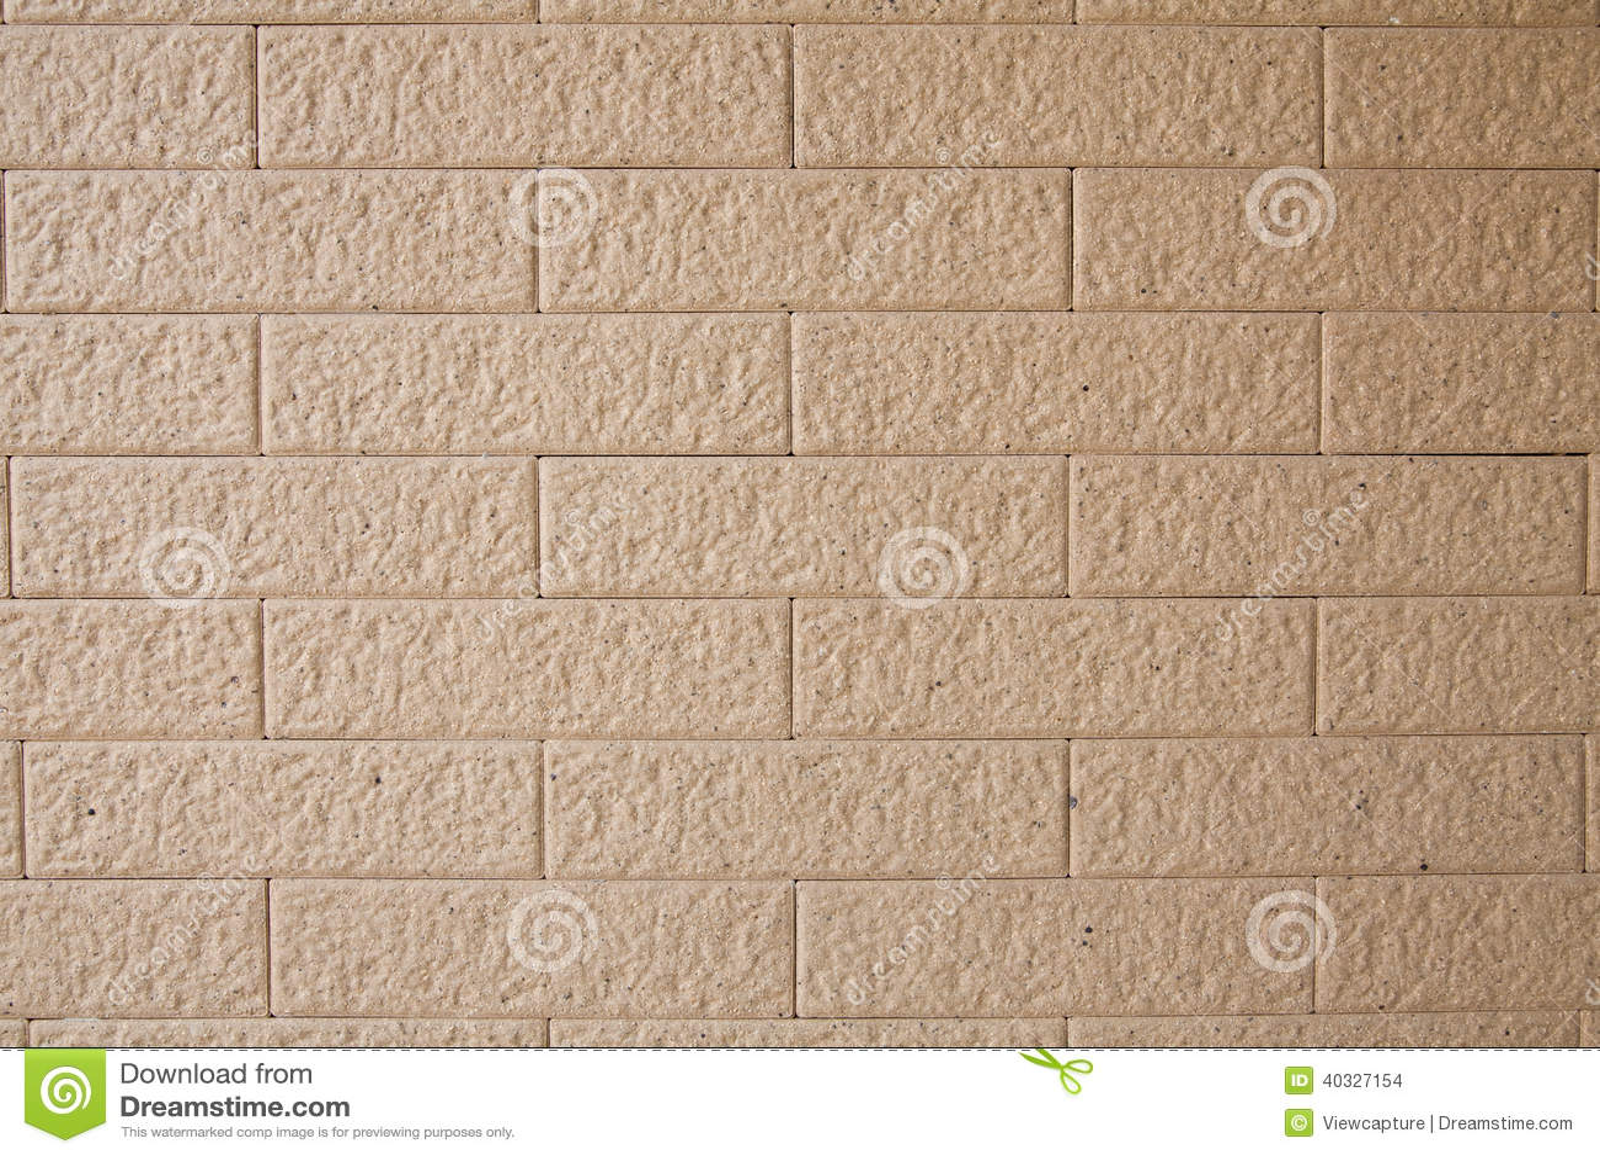 Unglazed Ceramic Tile In Brick Pattern Stock Photo 40327154 Megapixl